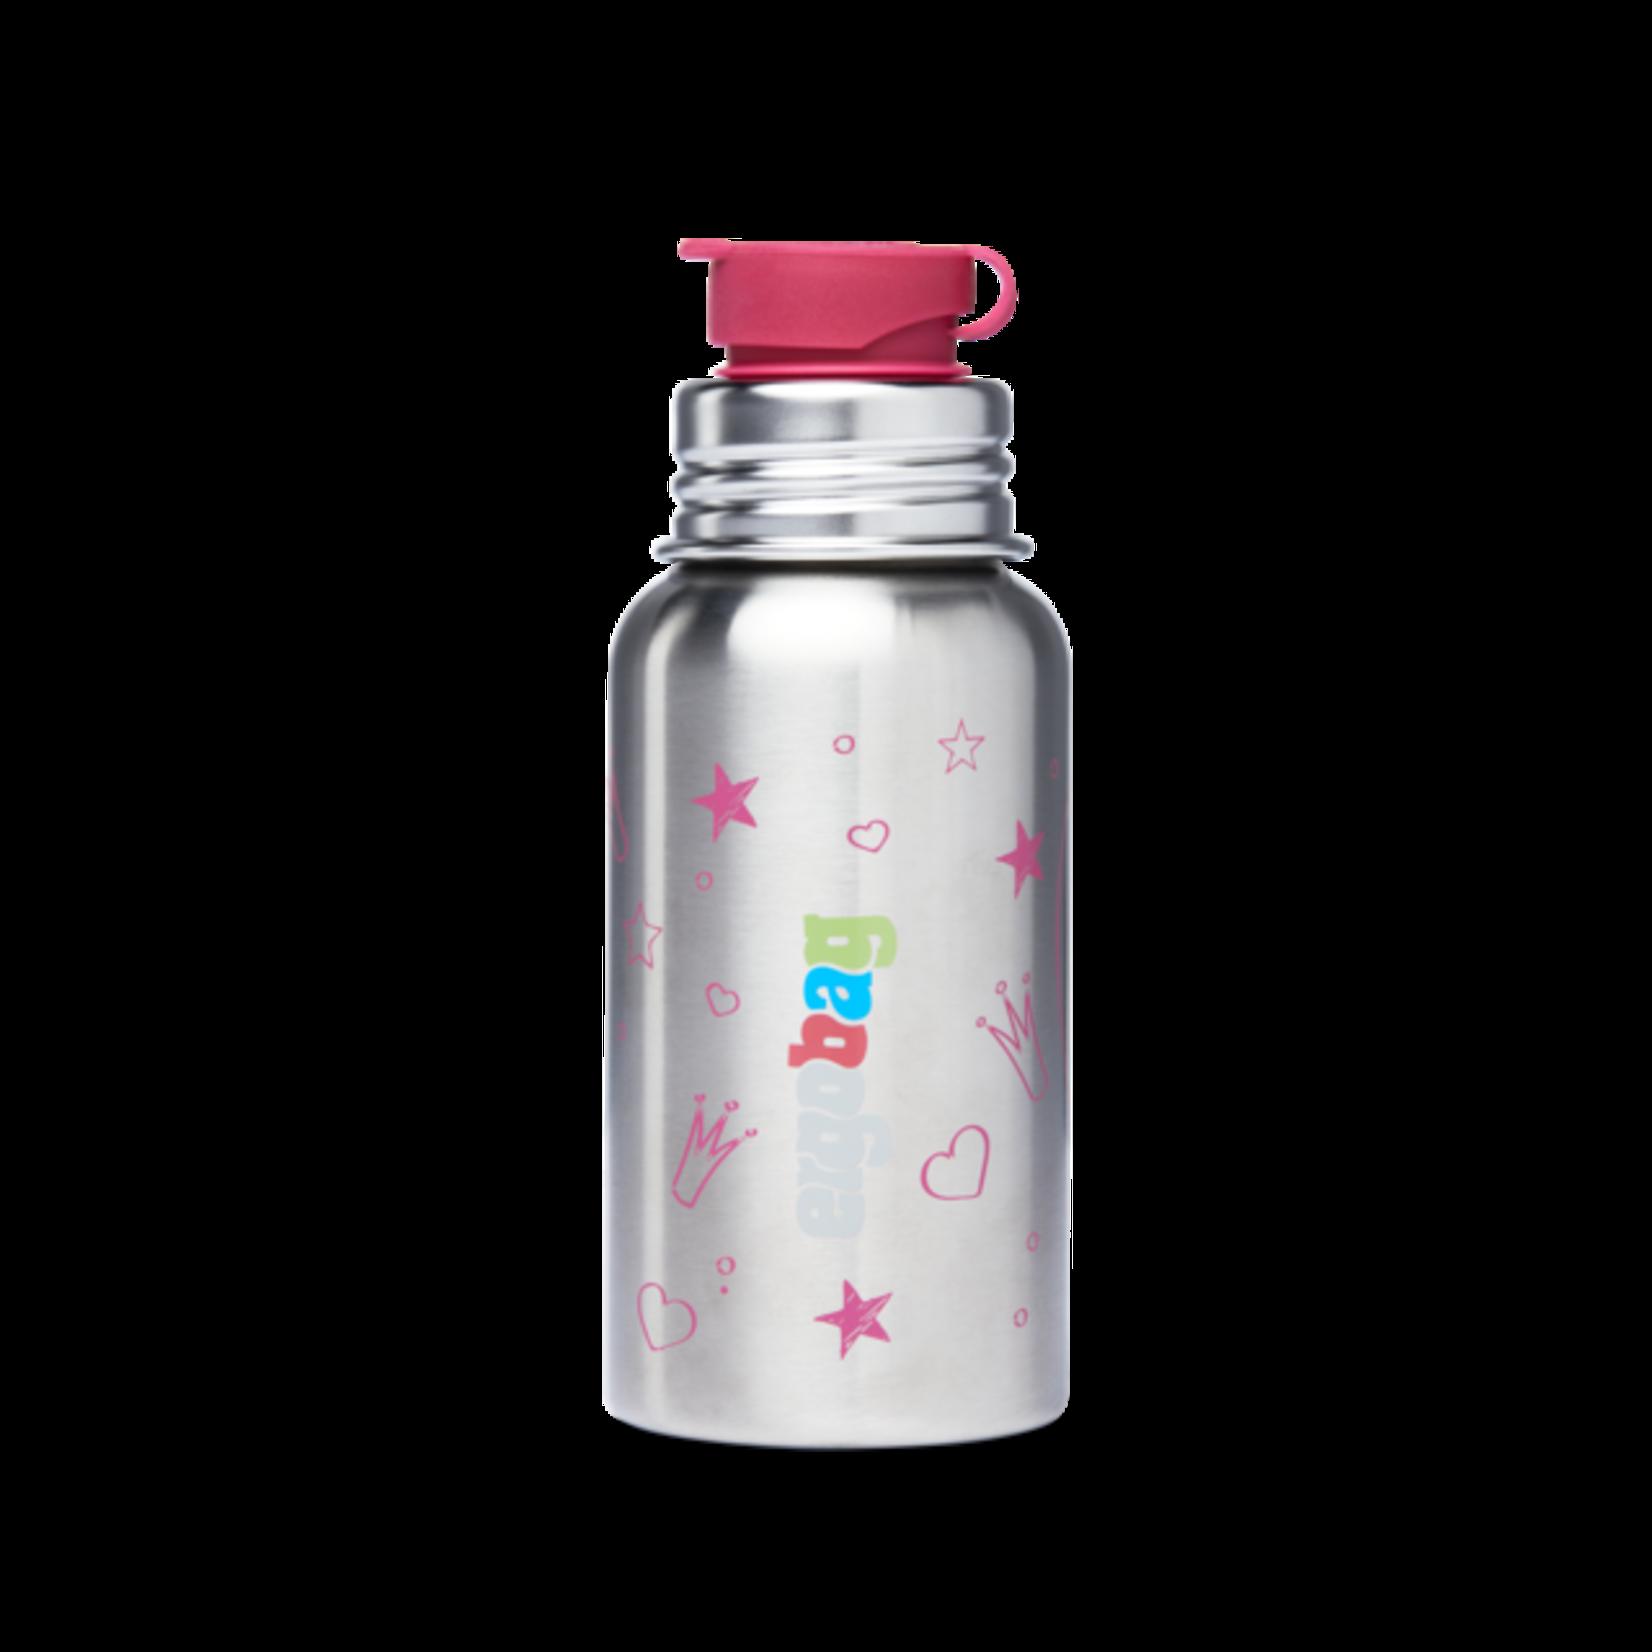 ERGOBAG Edelstahl-Trinkflasche